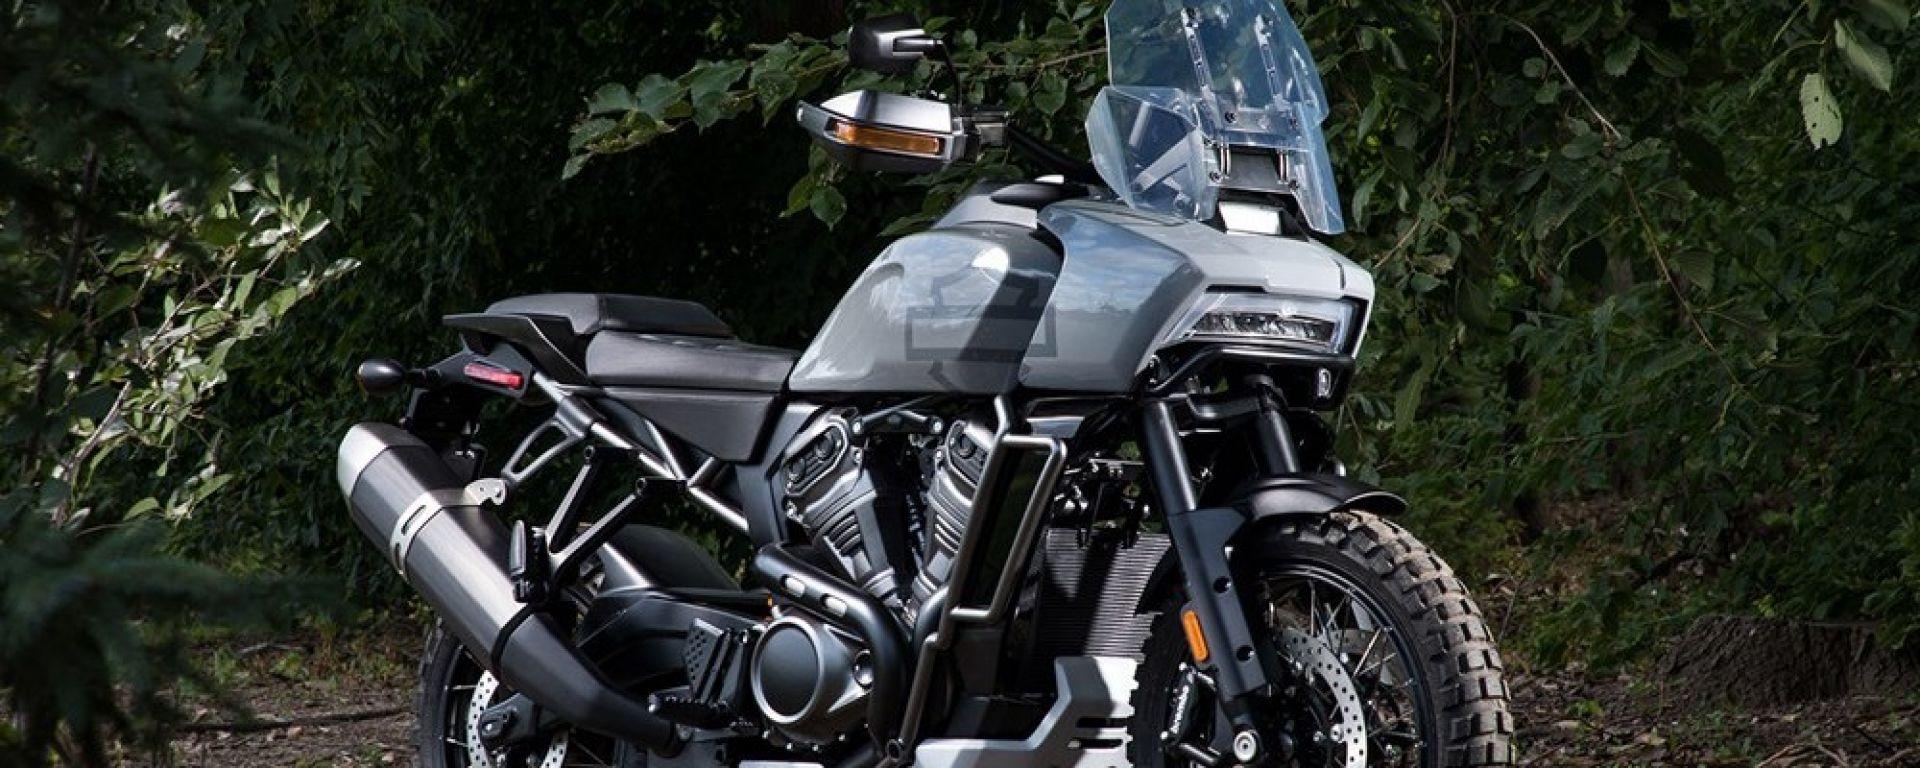 Harley davidson pan america ecco come sar l 39 enduro di harley davidson motorbox - Sigle harley davidson ...